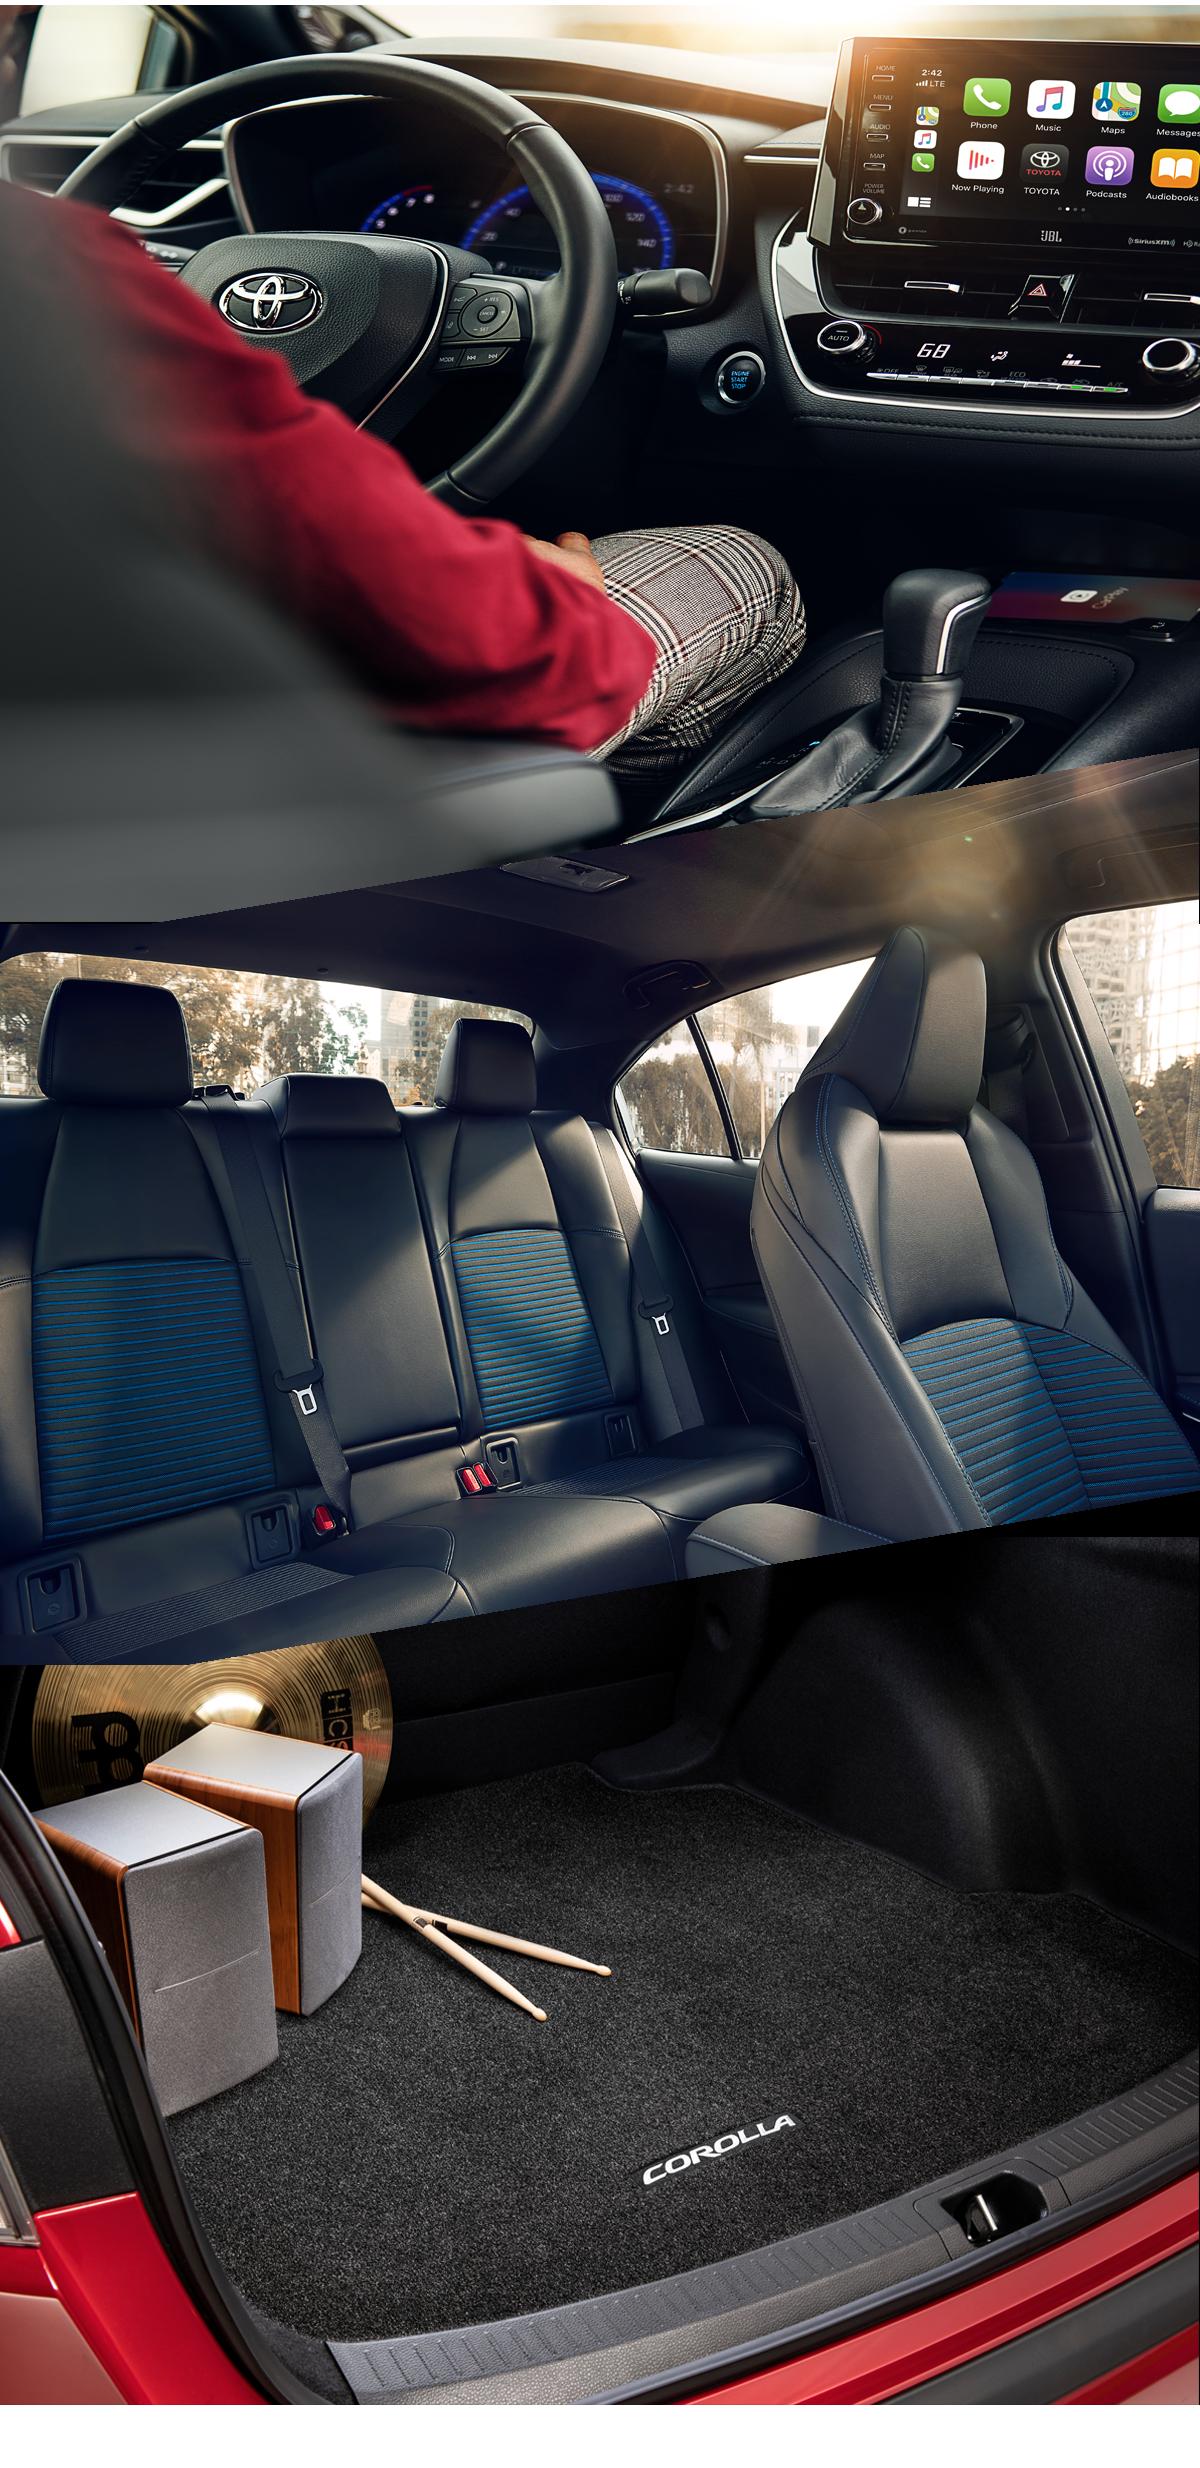 2021 Toyota Corolla Interior in Gullup, NM